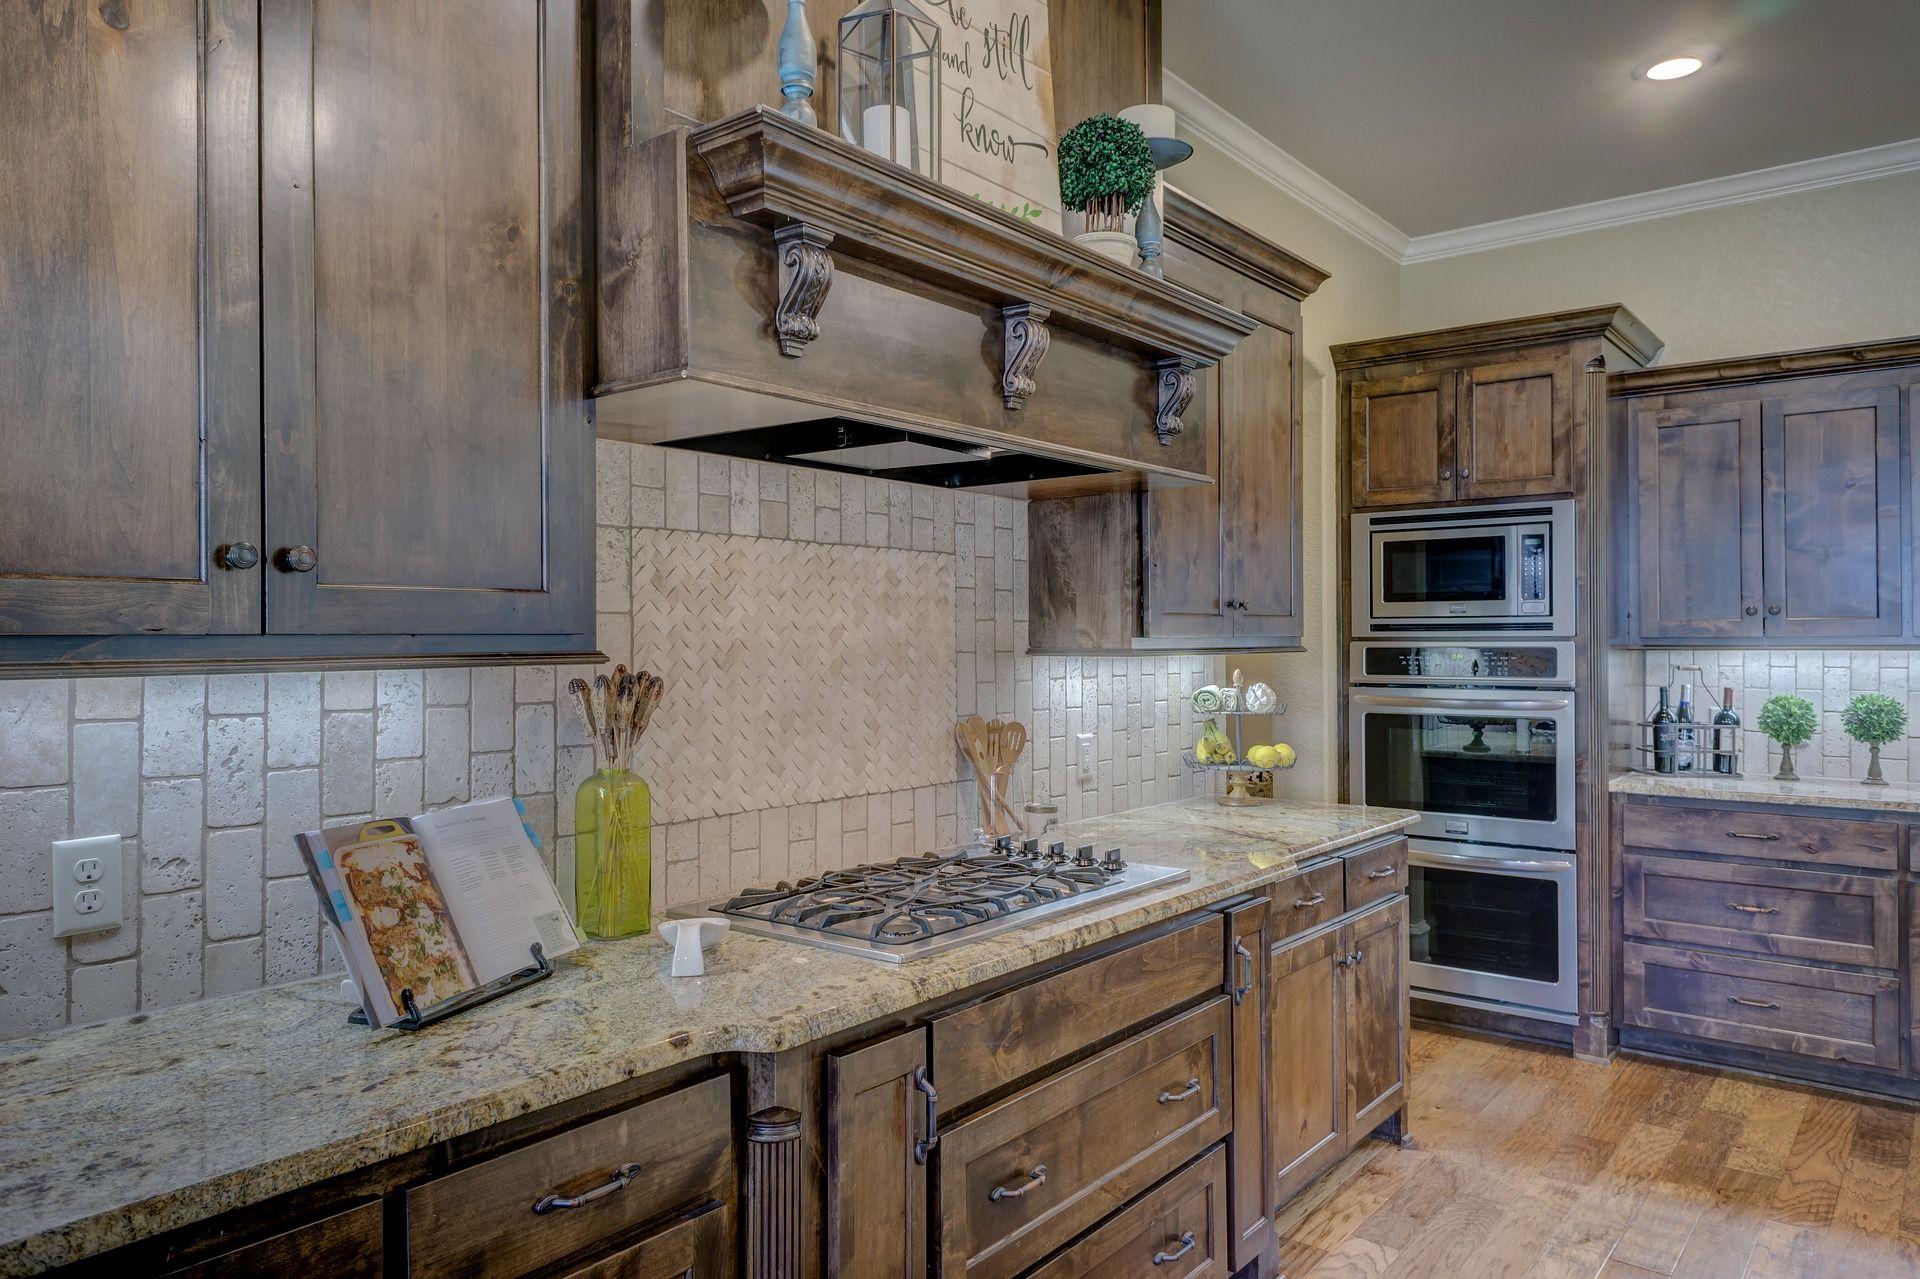 Choosing a Kitchen Backsplash - featured image